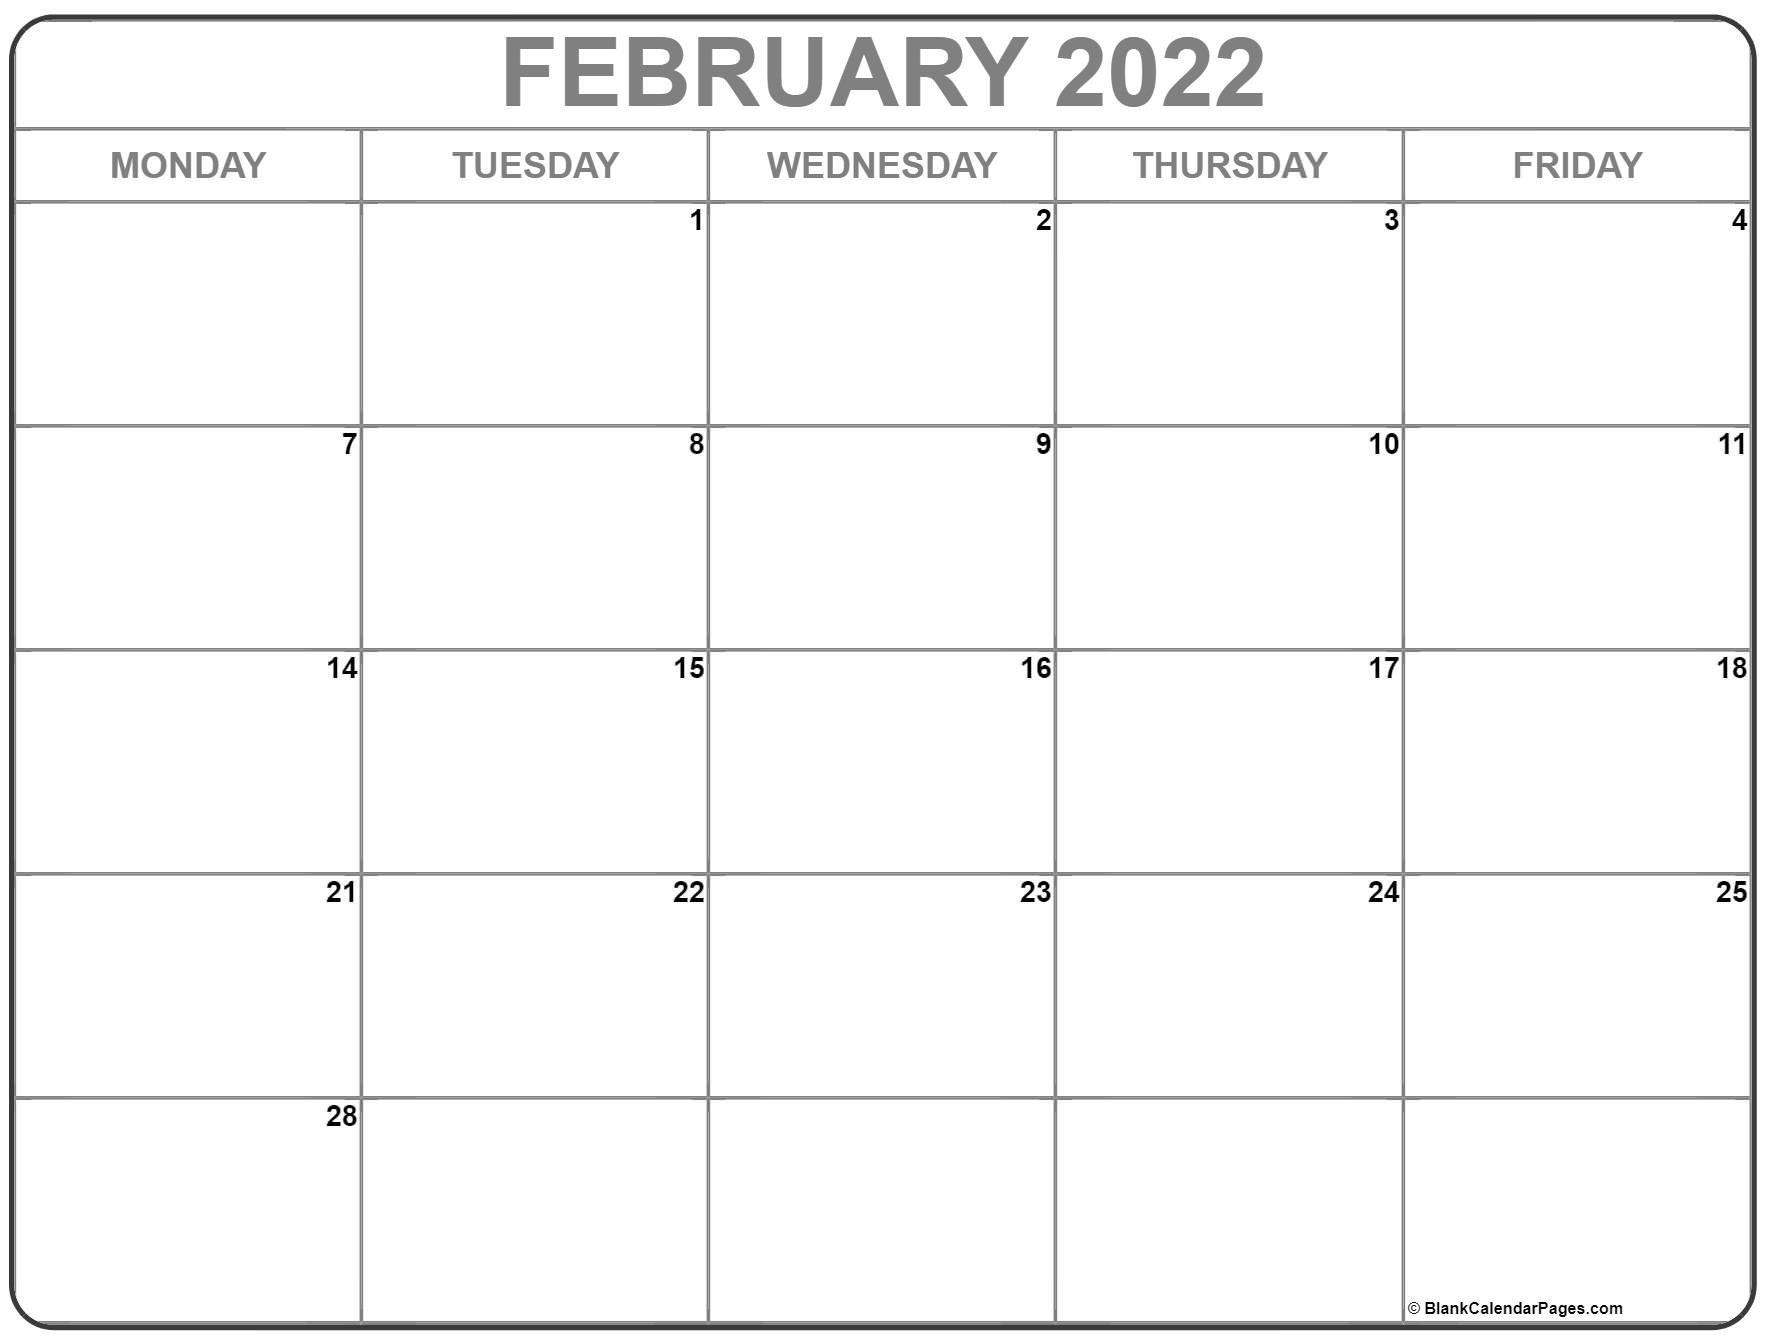 February 2022 Monday Calendar | Monday To Sunday Monday Through Friday Printable